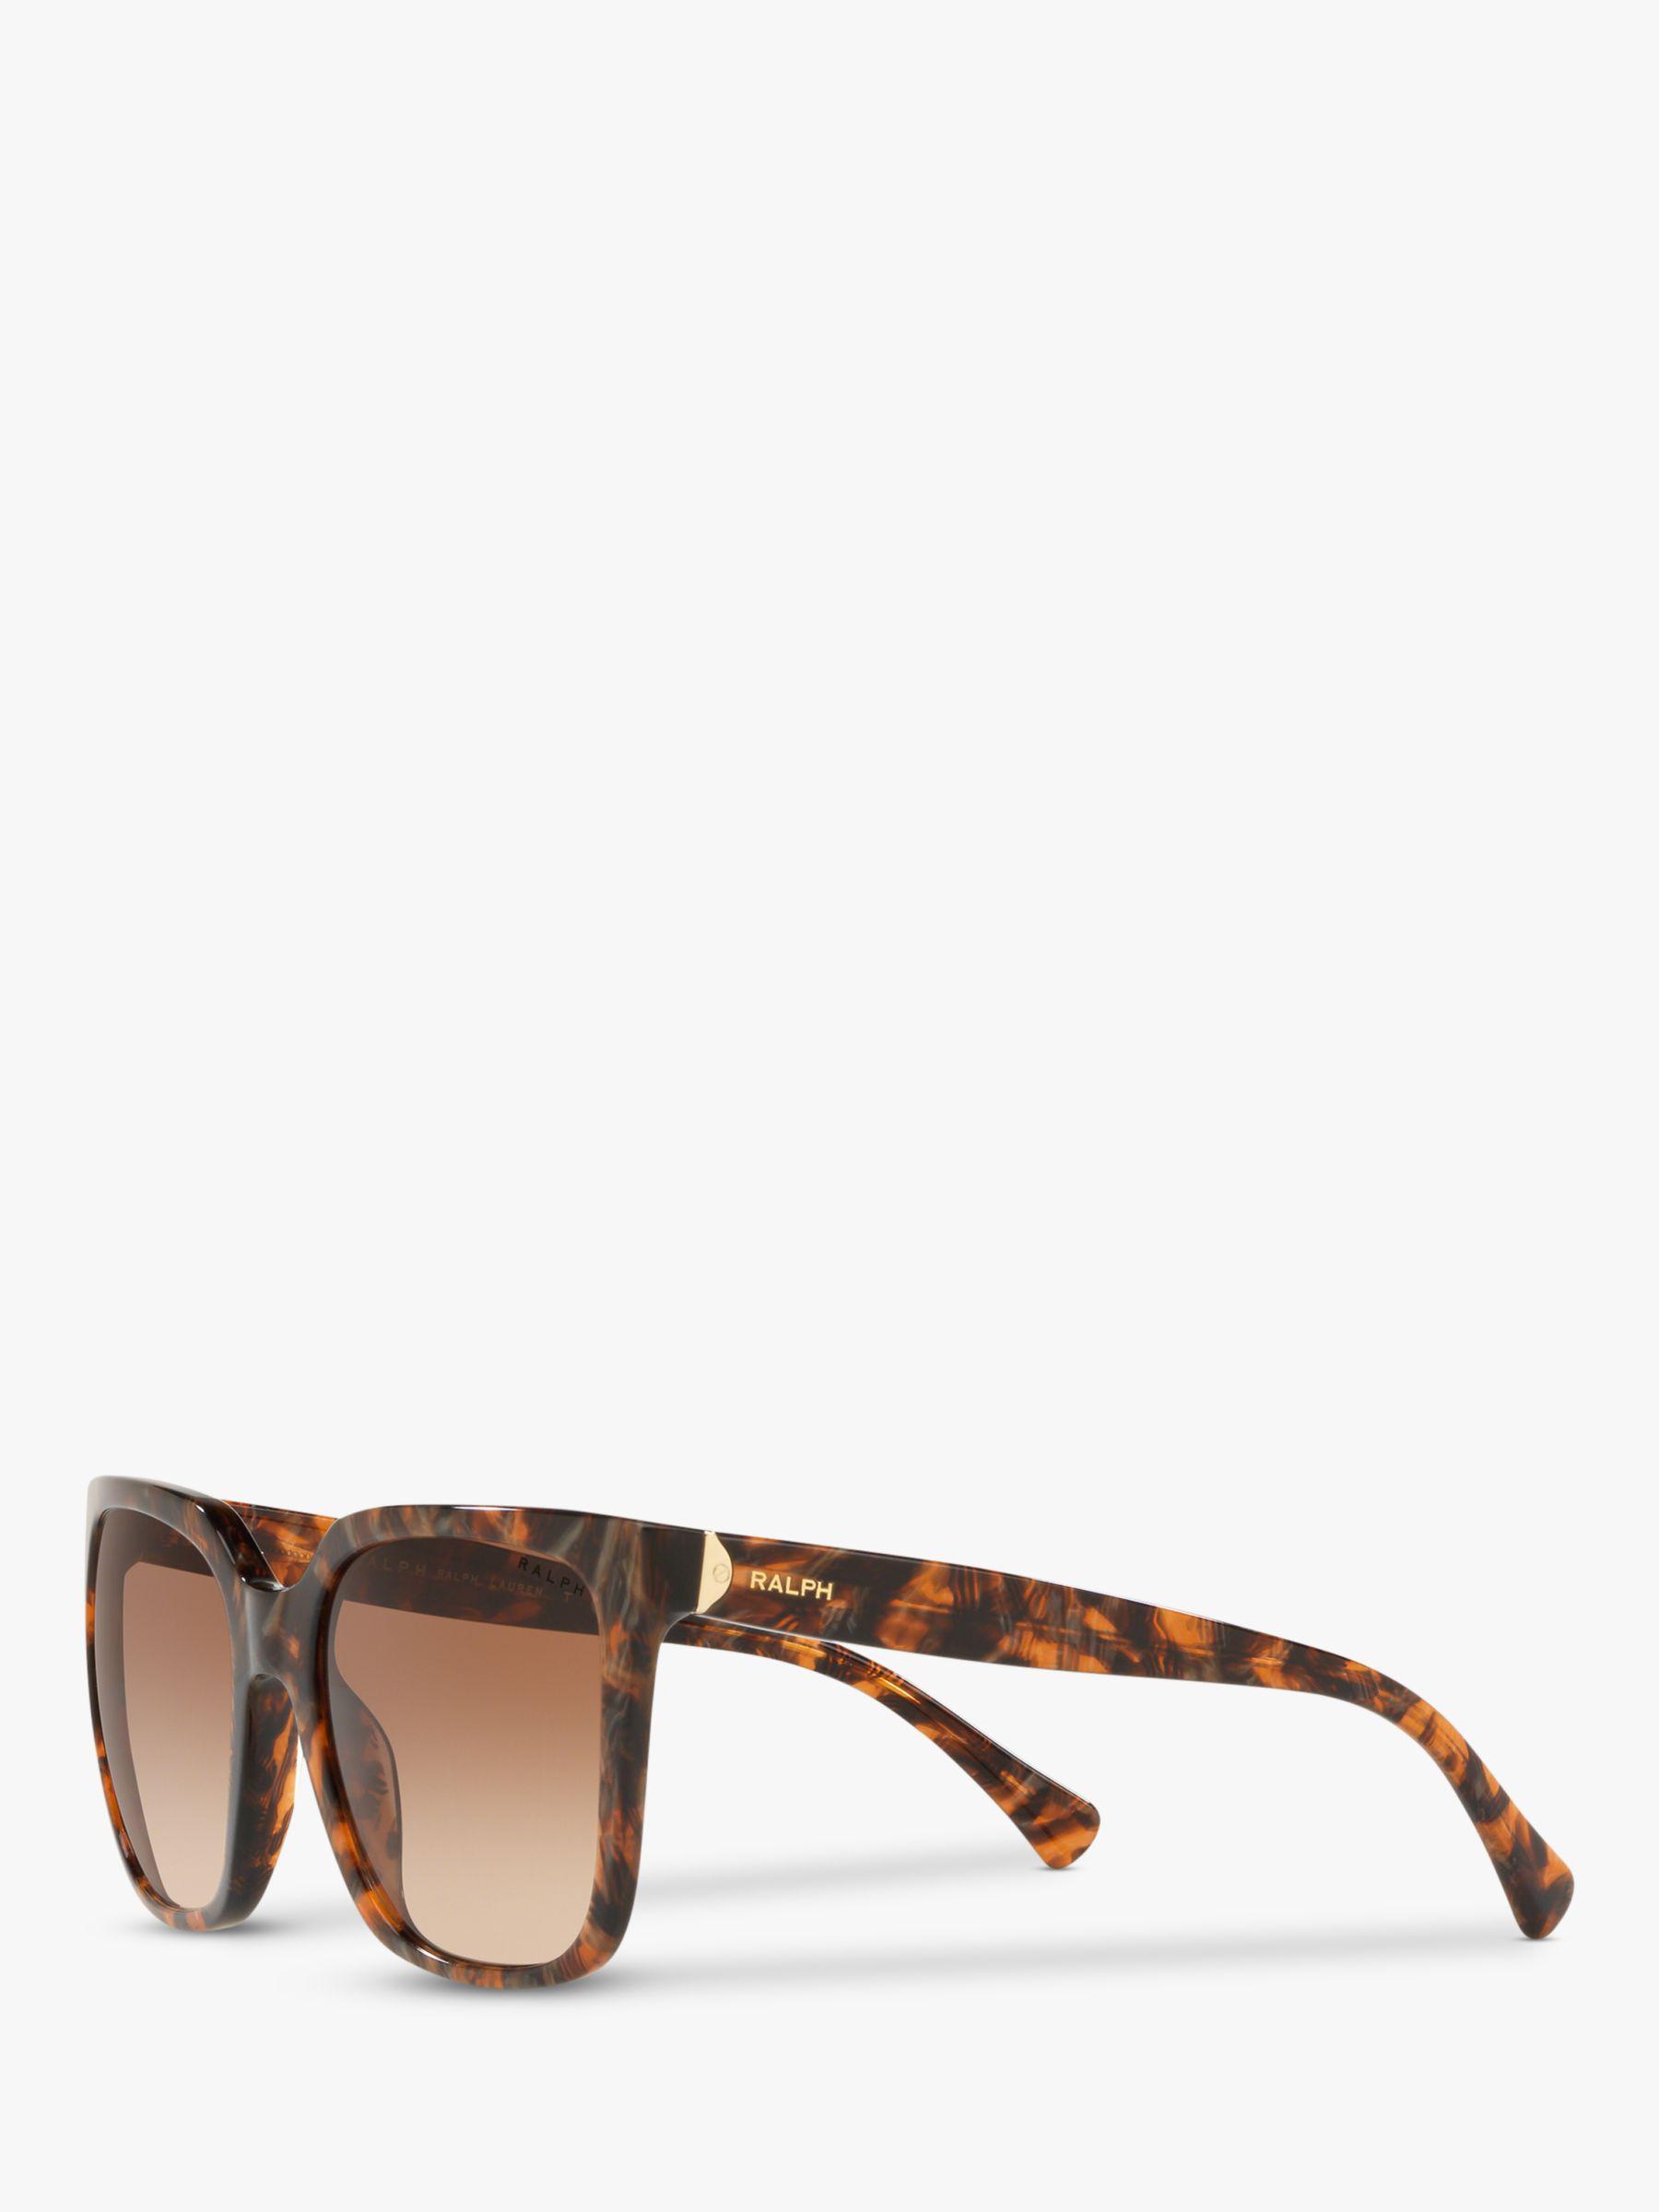 ae32d66d6caa Ralph Lauren Polo Ra5251 Women's Square Sunglasses in Brown - Lyst